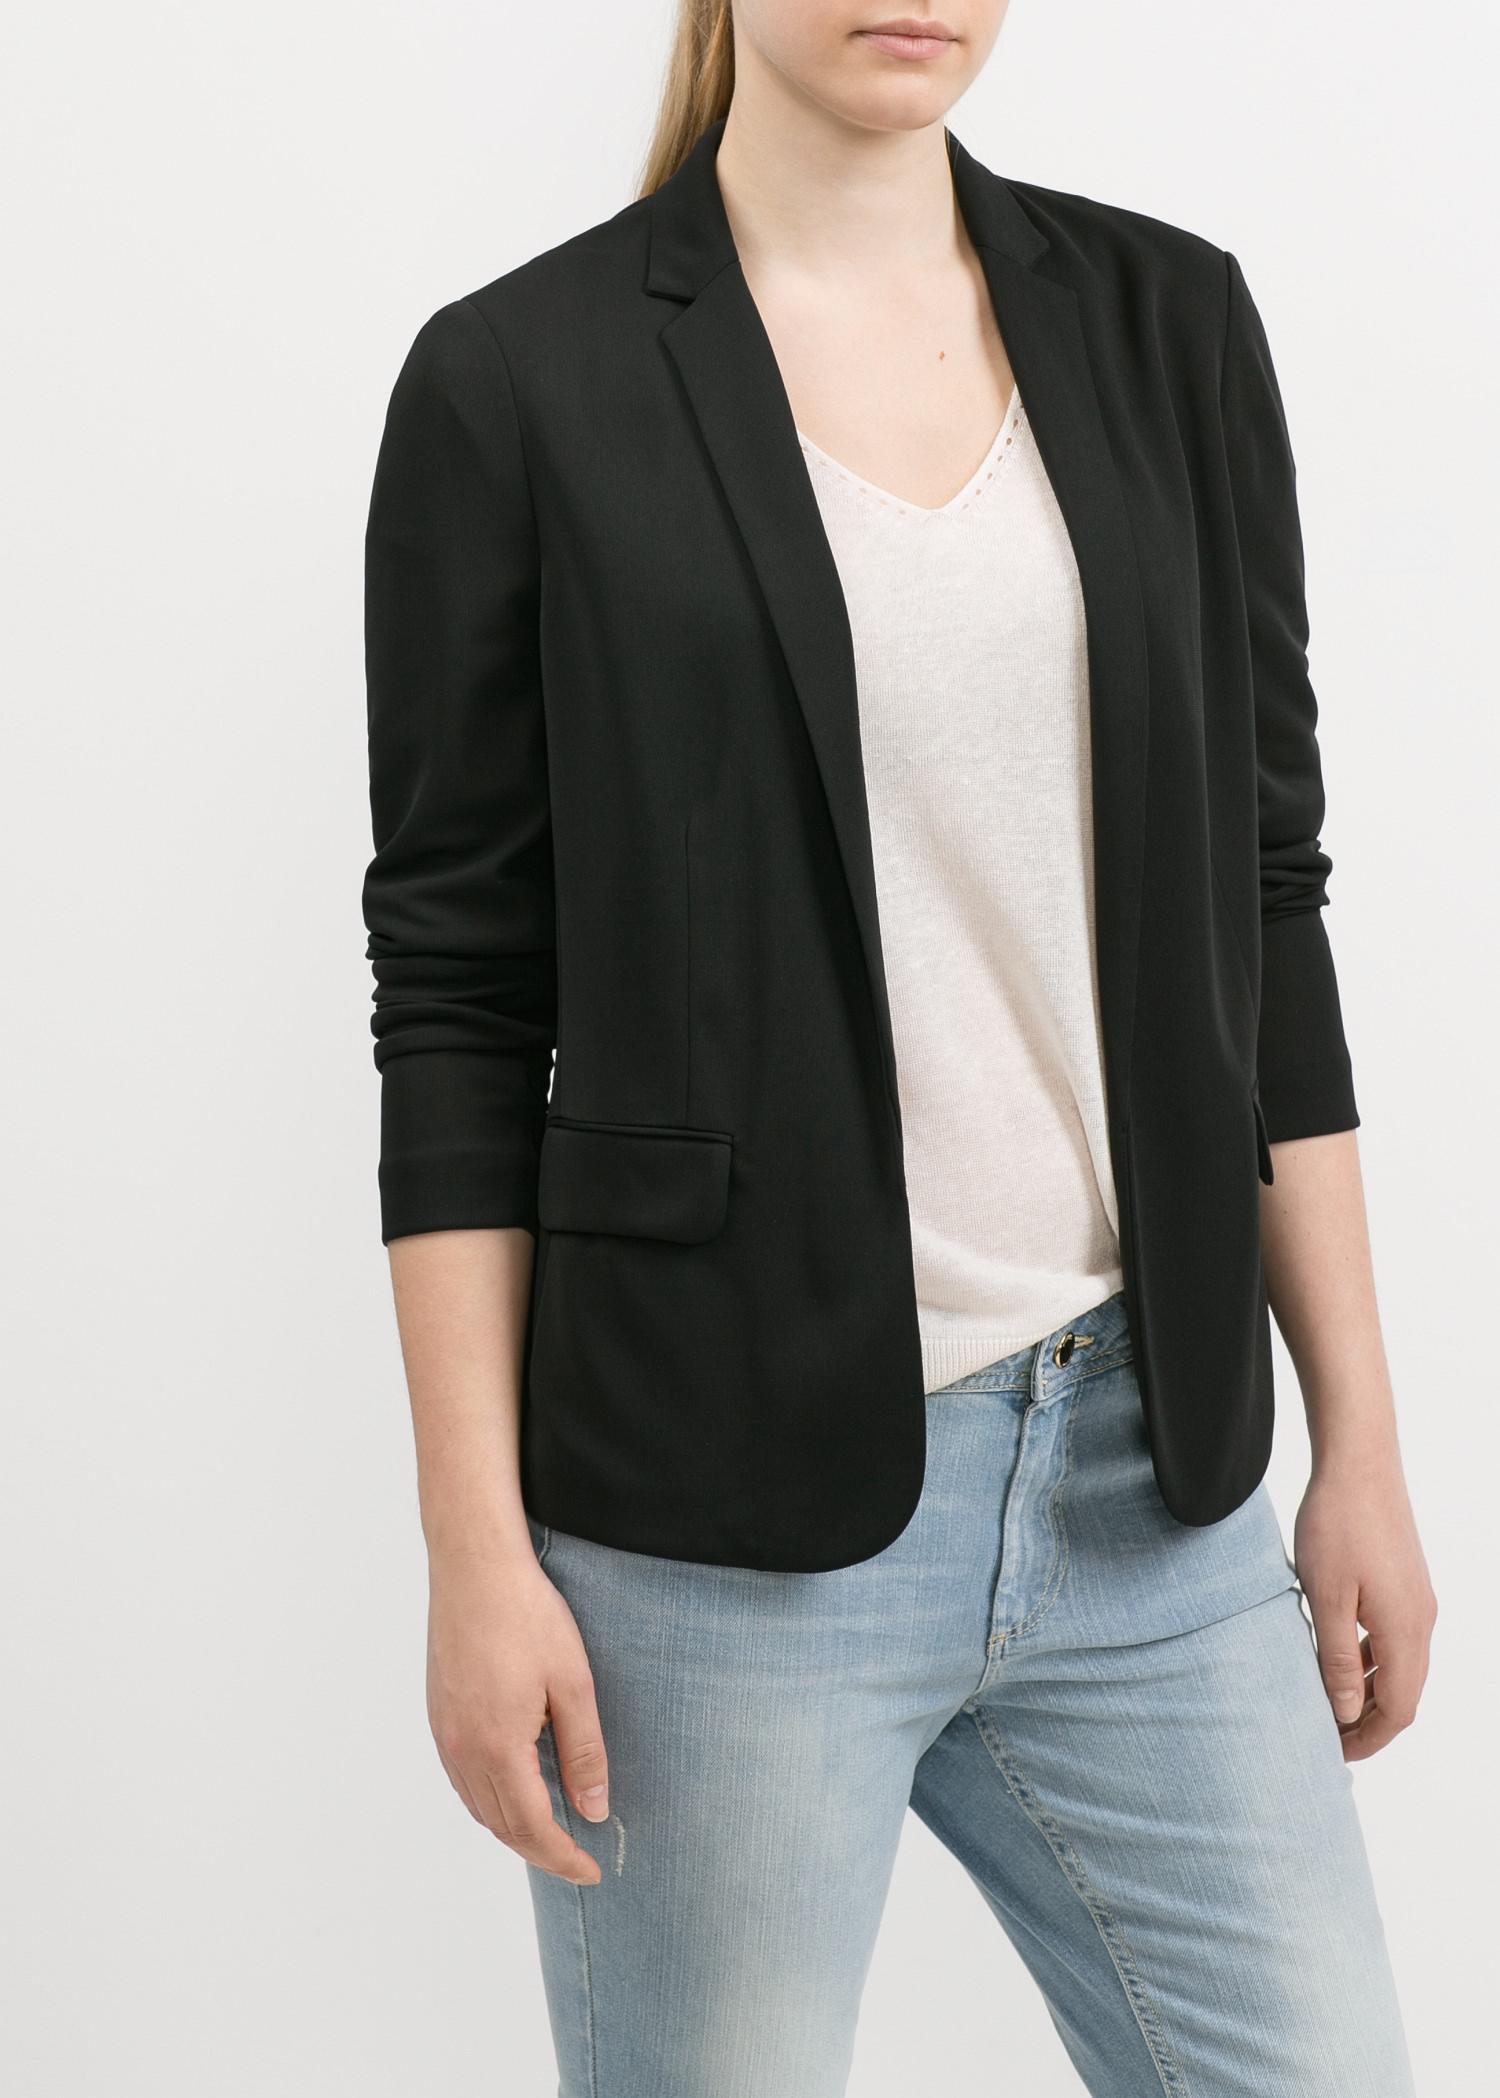 Flowy blazer - T-shirts and tops for Women | MANGO